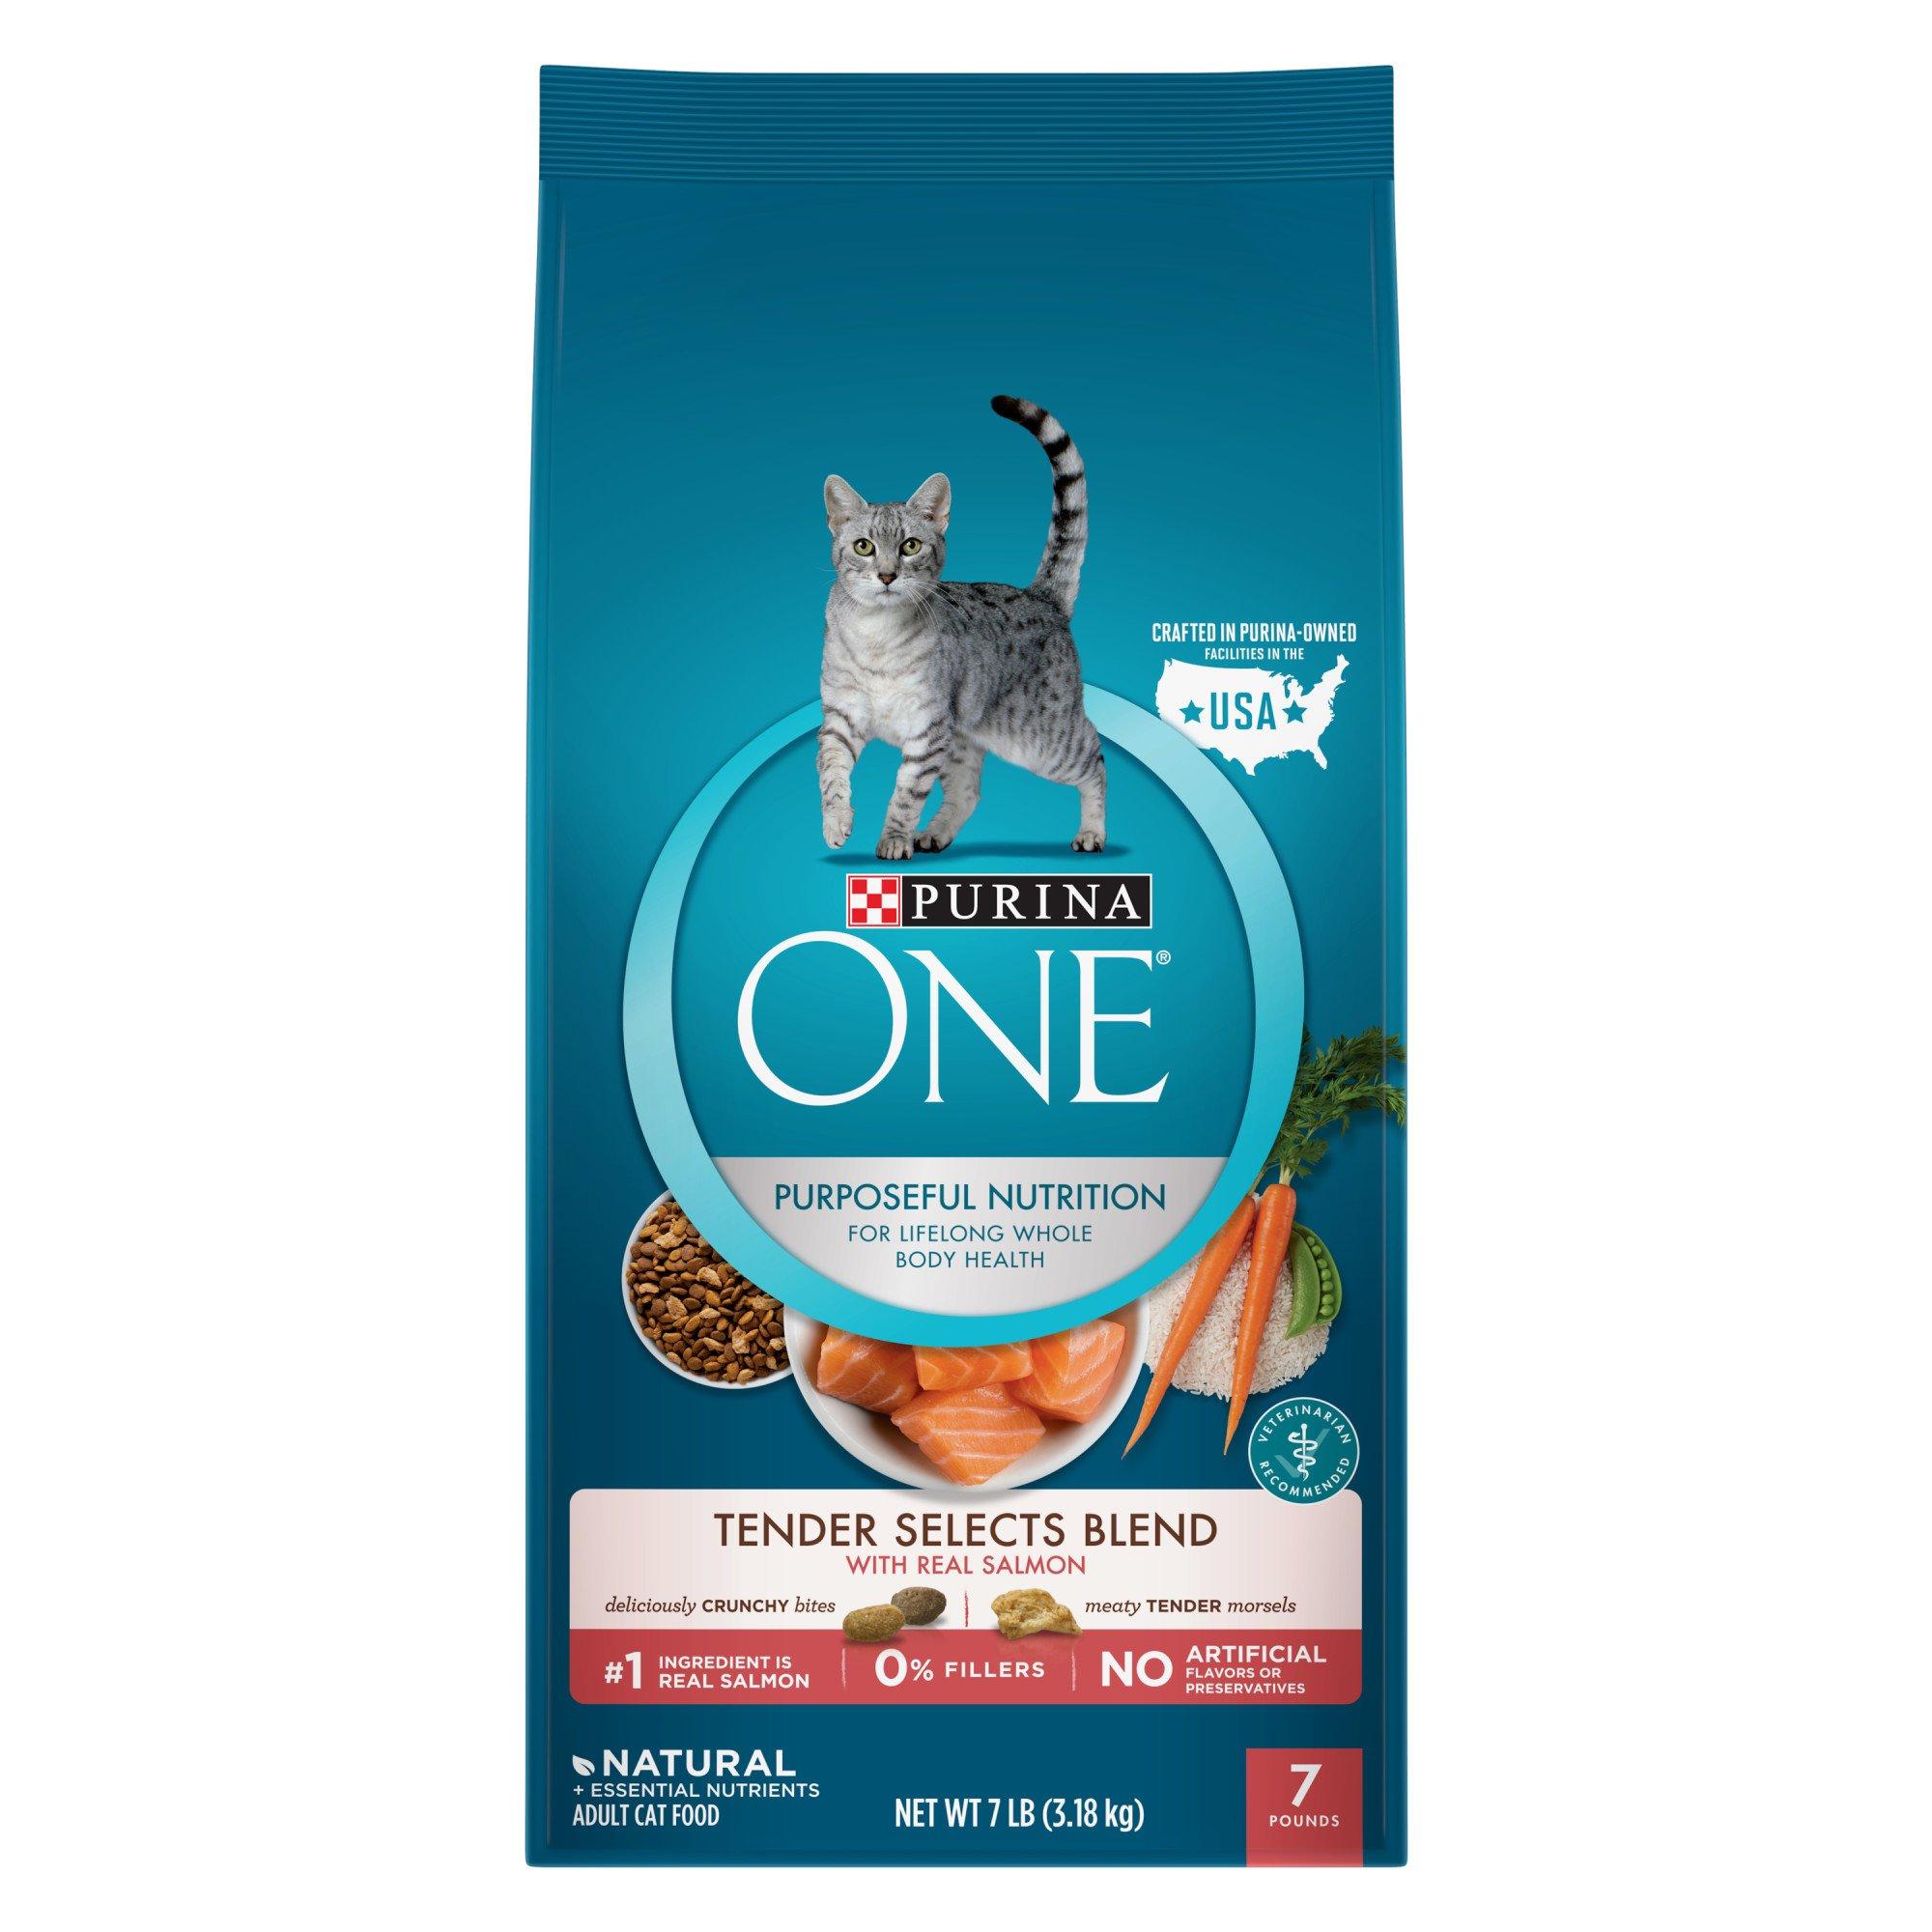 Purina ONE Salmon & Tuna Flavor Cat Food